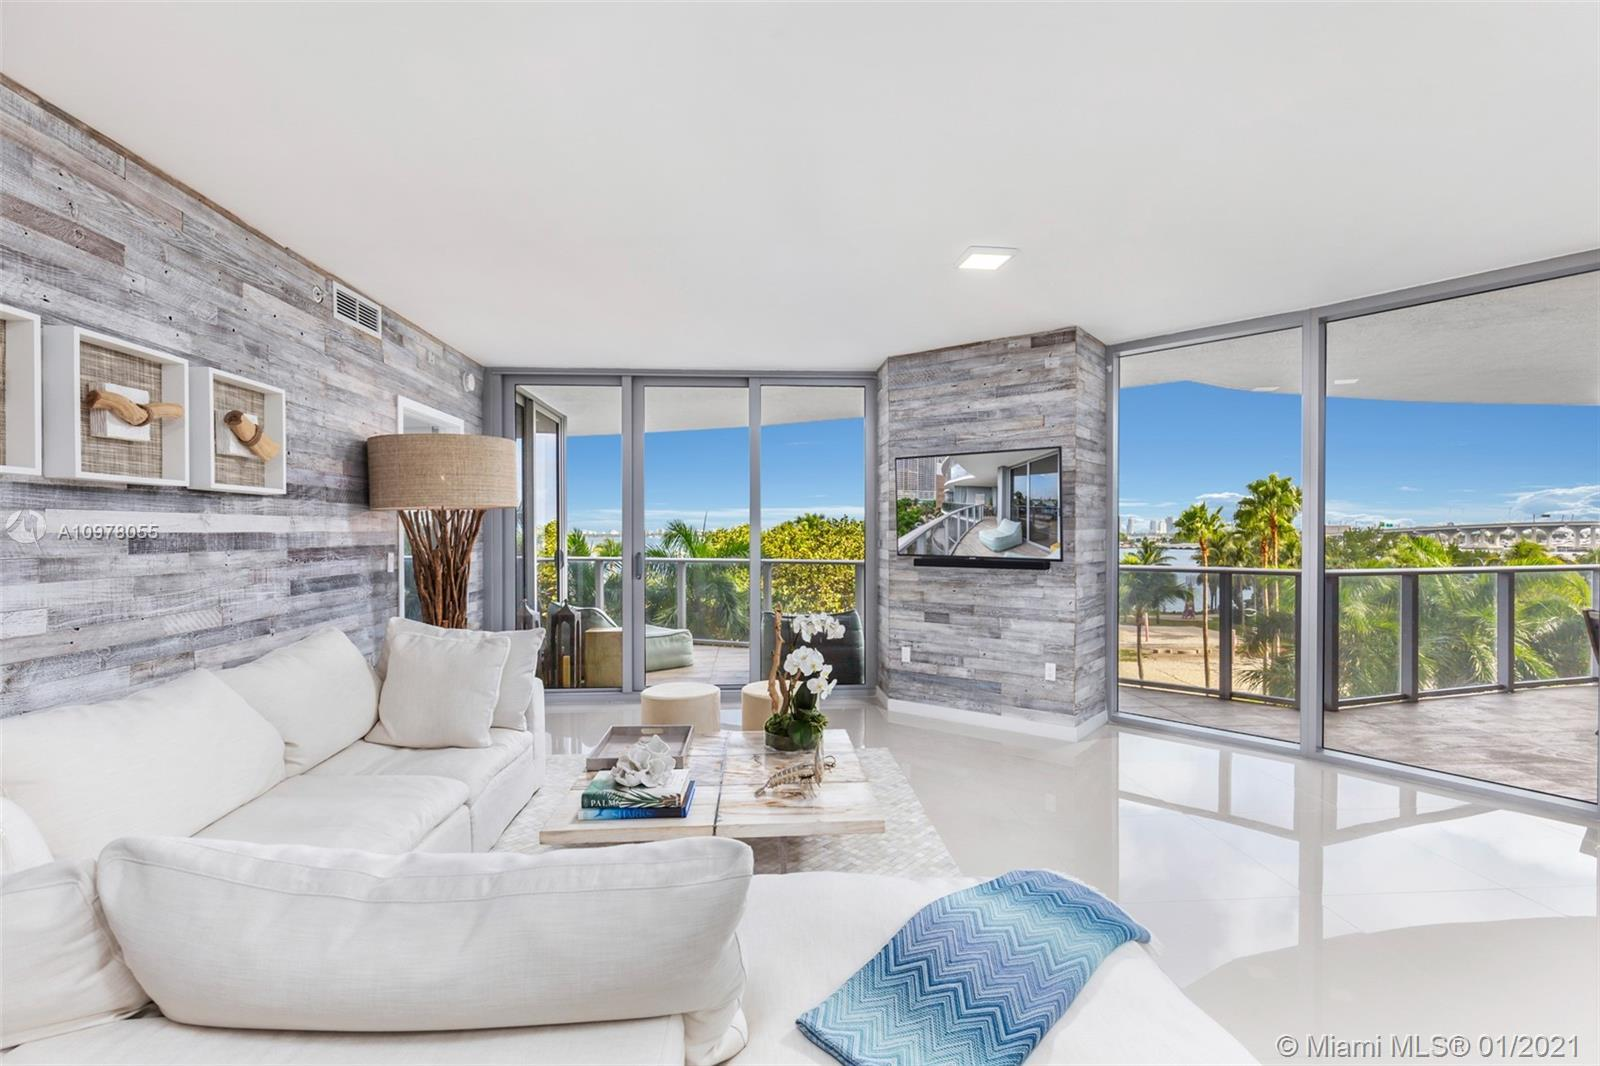 New development. Aria on the Bay is a luxury edgewater condominium with glamorous lobby, full amenit